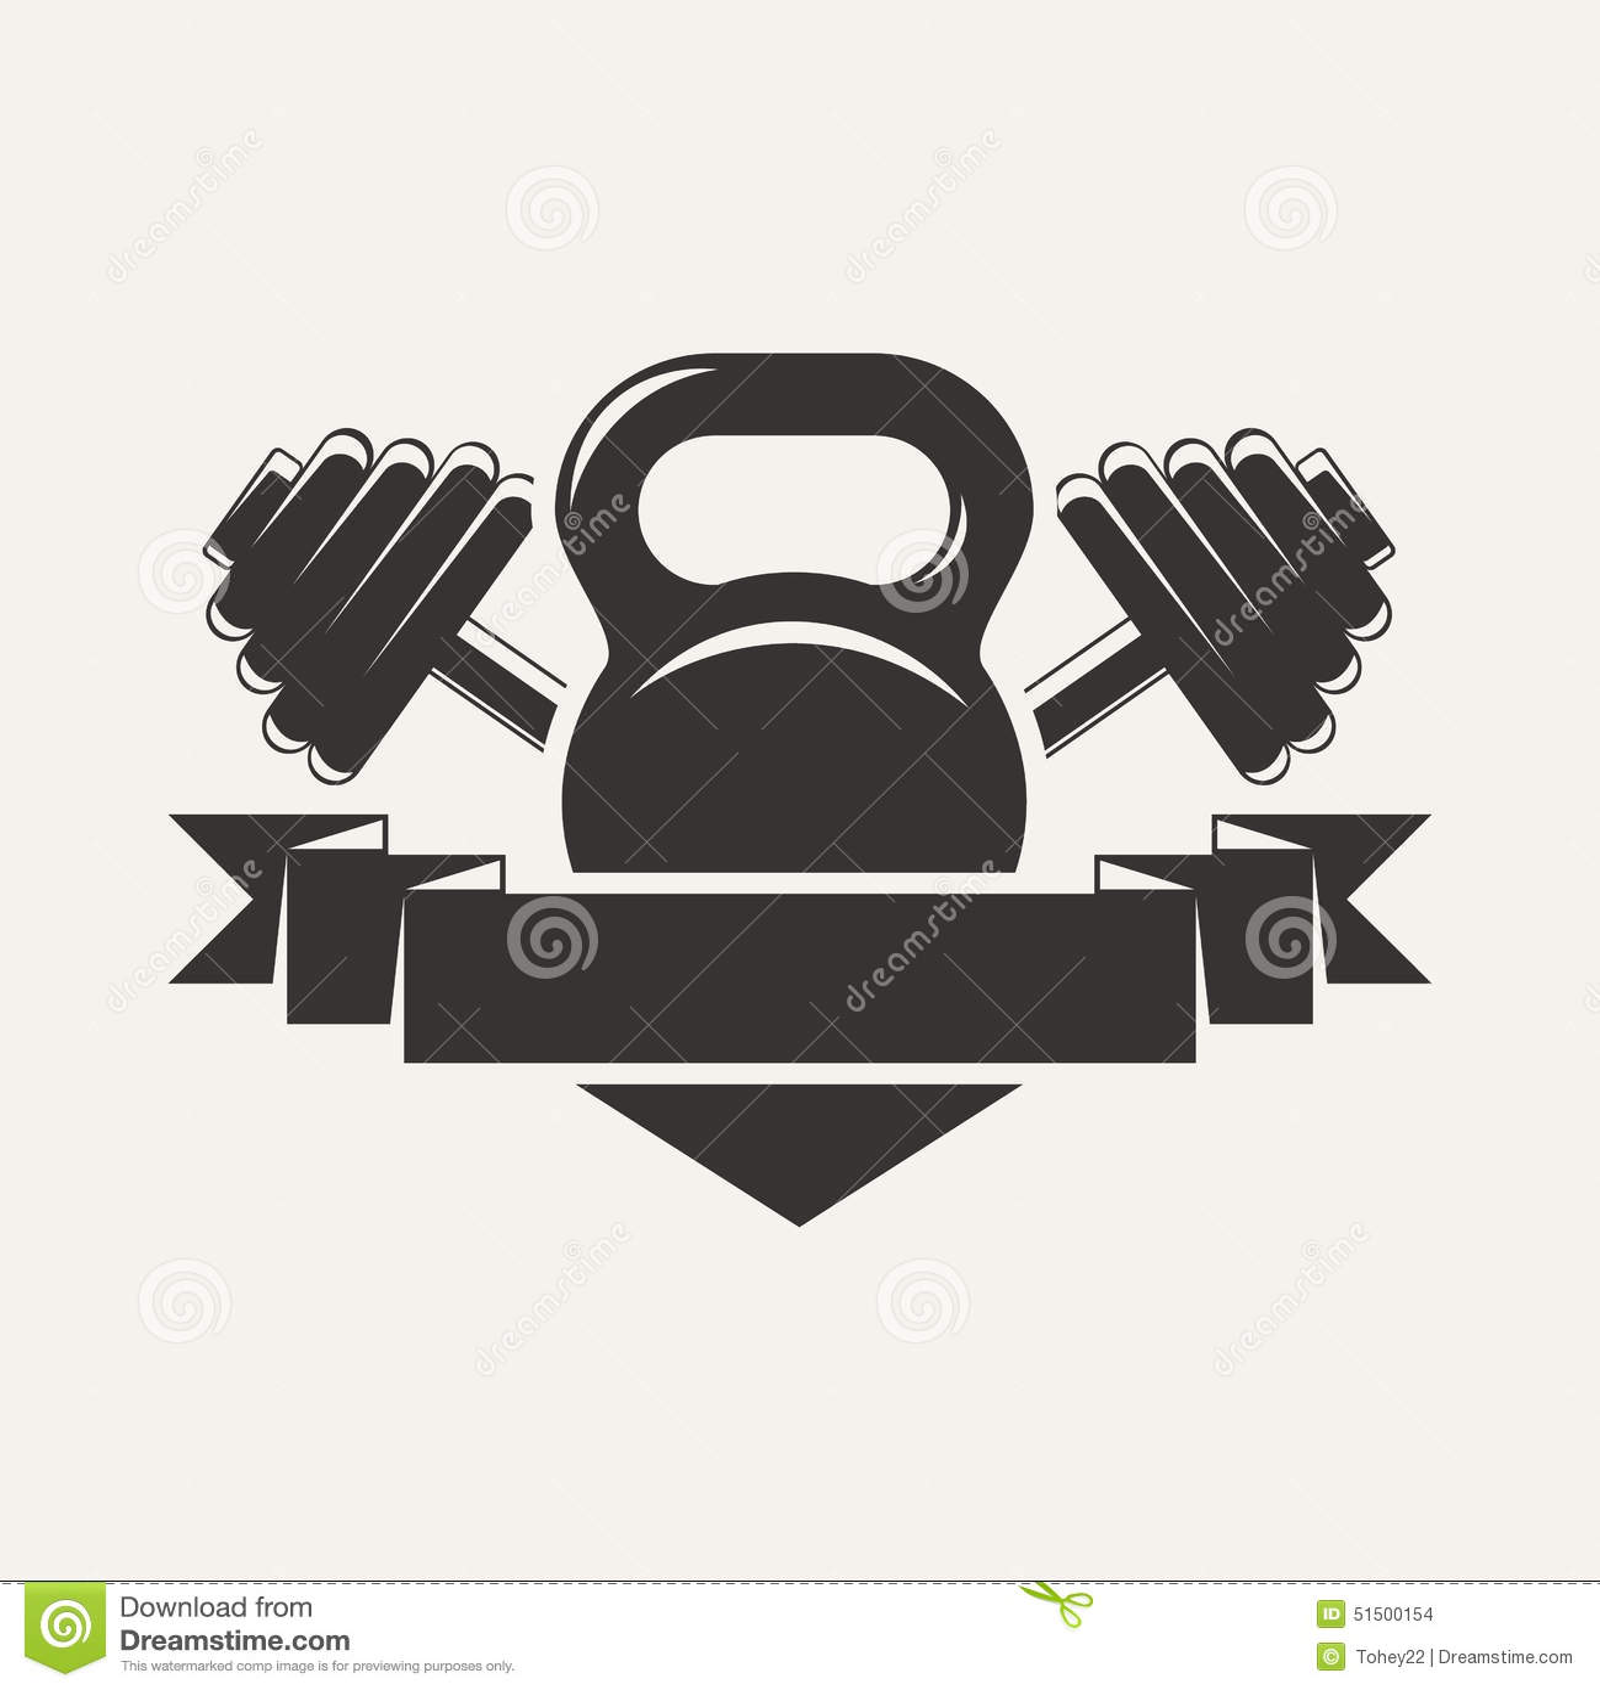 Gym Equipment Logo: Kettlebell And Dumbbell With Baner Logo Stock Vector